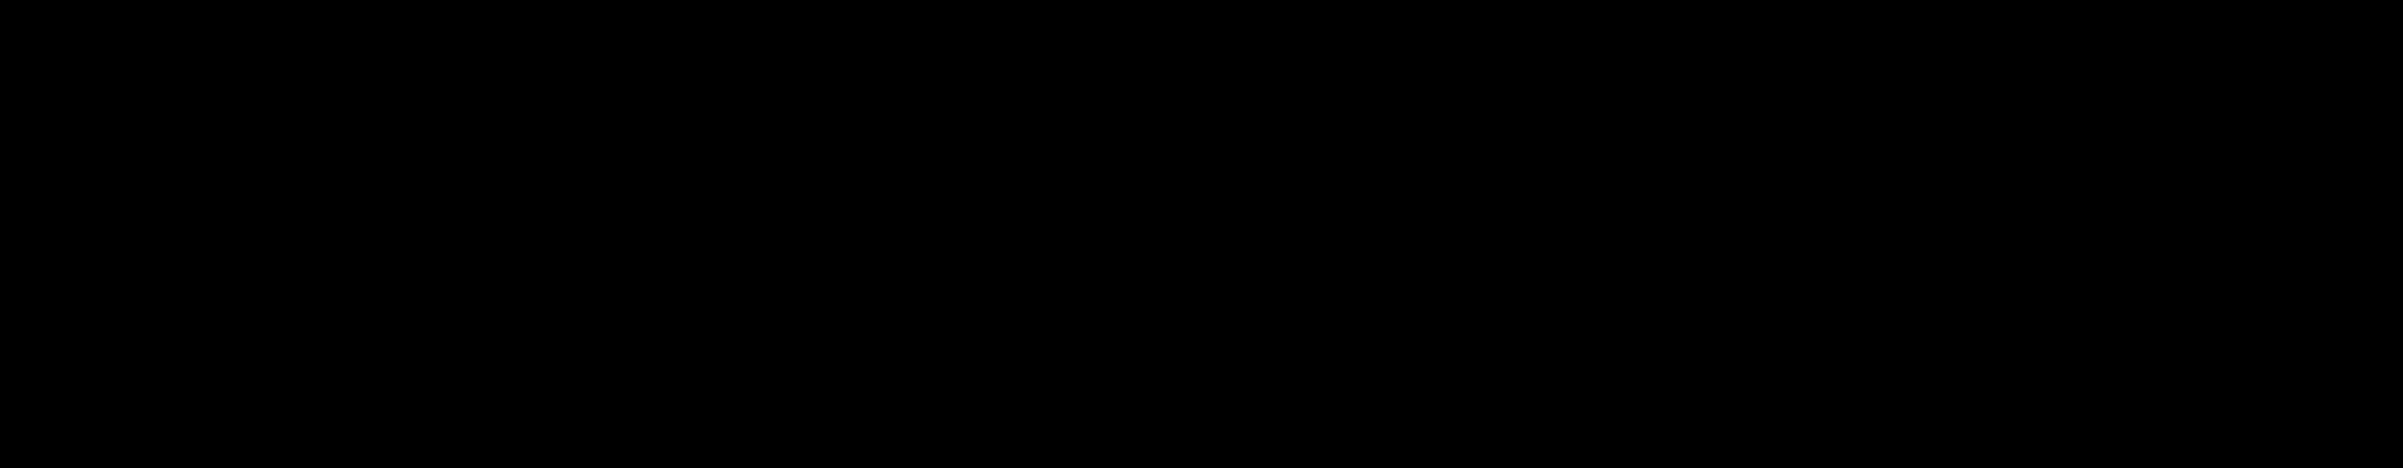 ACROPASS